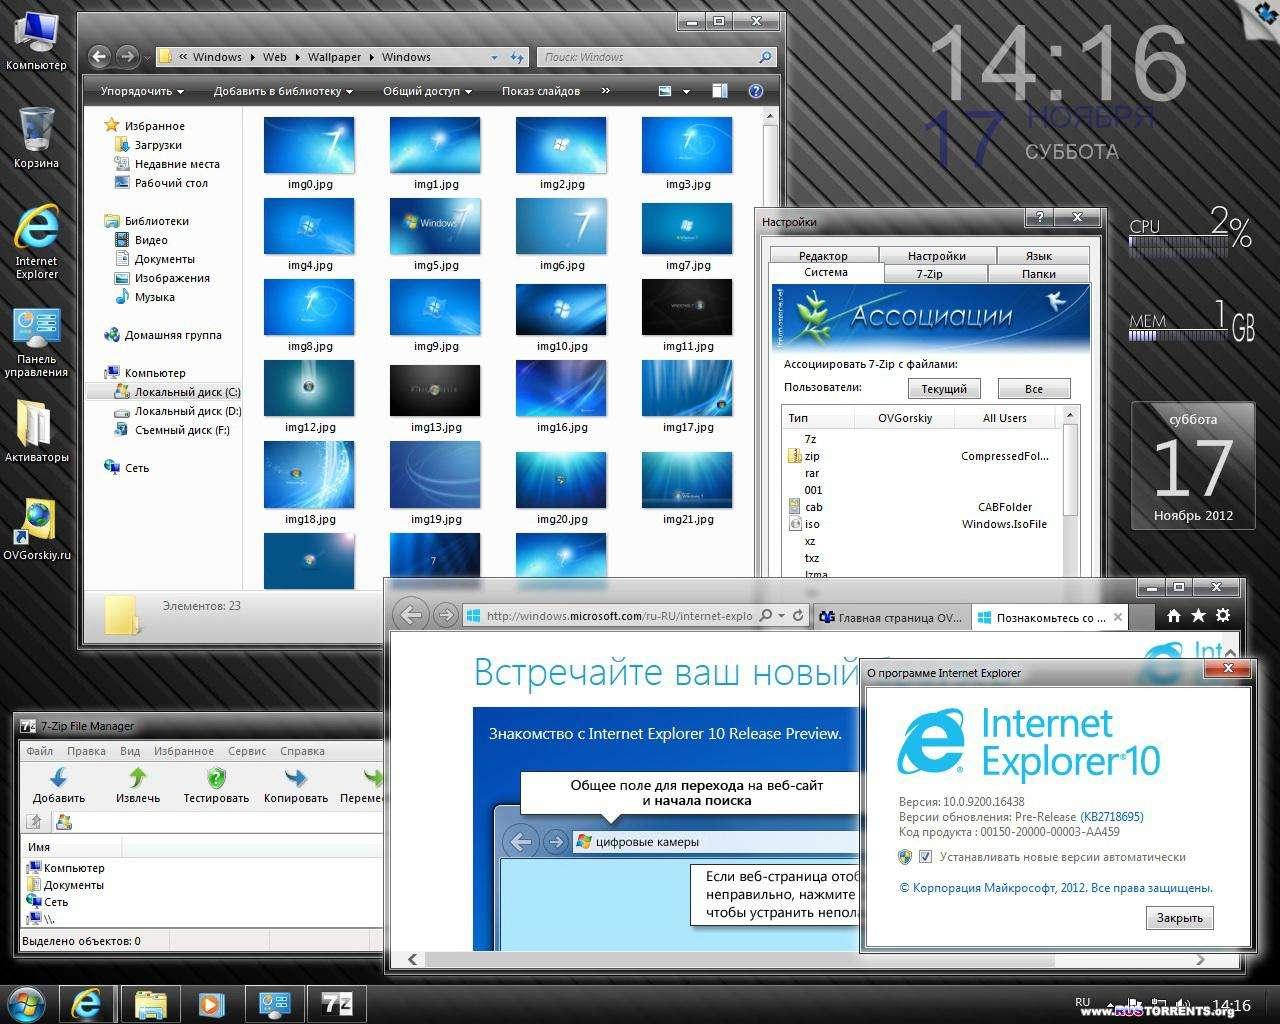 Windows 7 Ultimate nBook ie10 x86-x64 Ru by OVGorskiy 11.2012 [Русский]